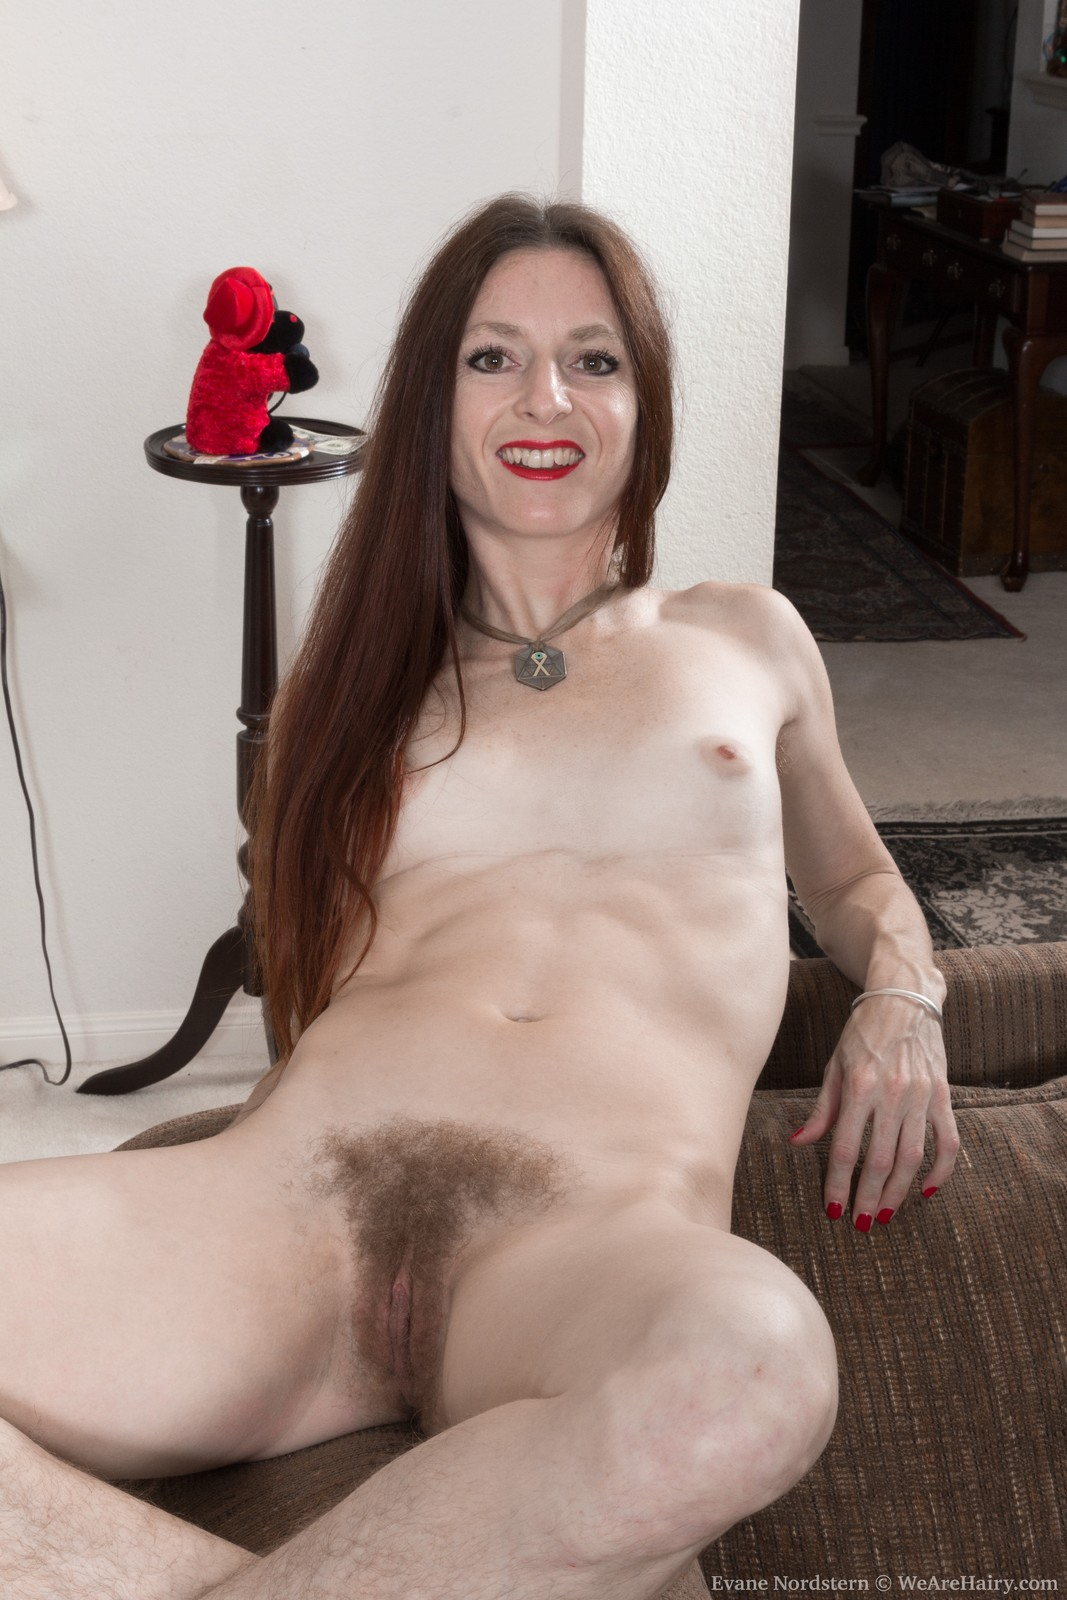 evane-nordstern-strips-naked-in-her-living-room12.jpg